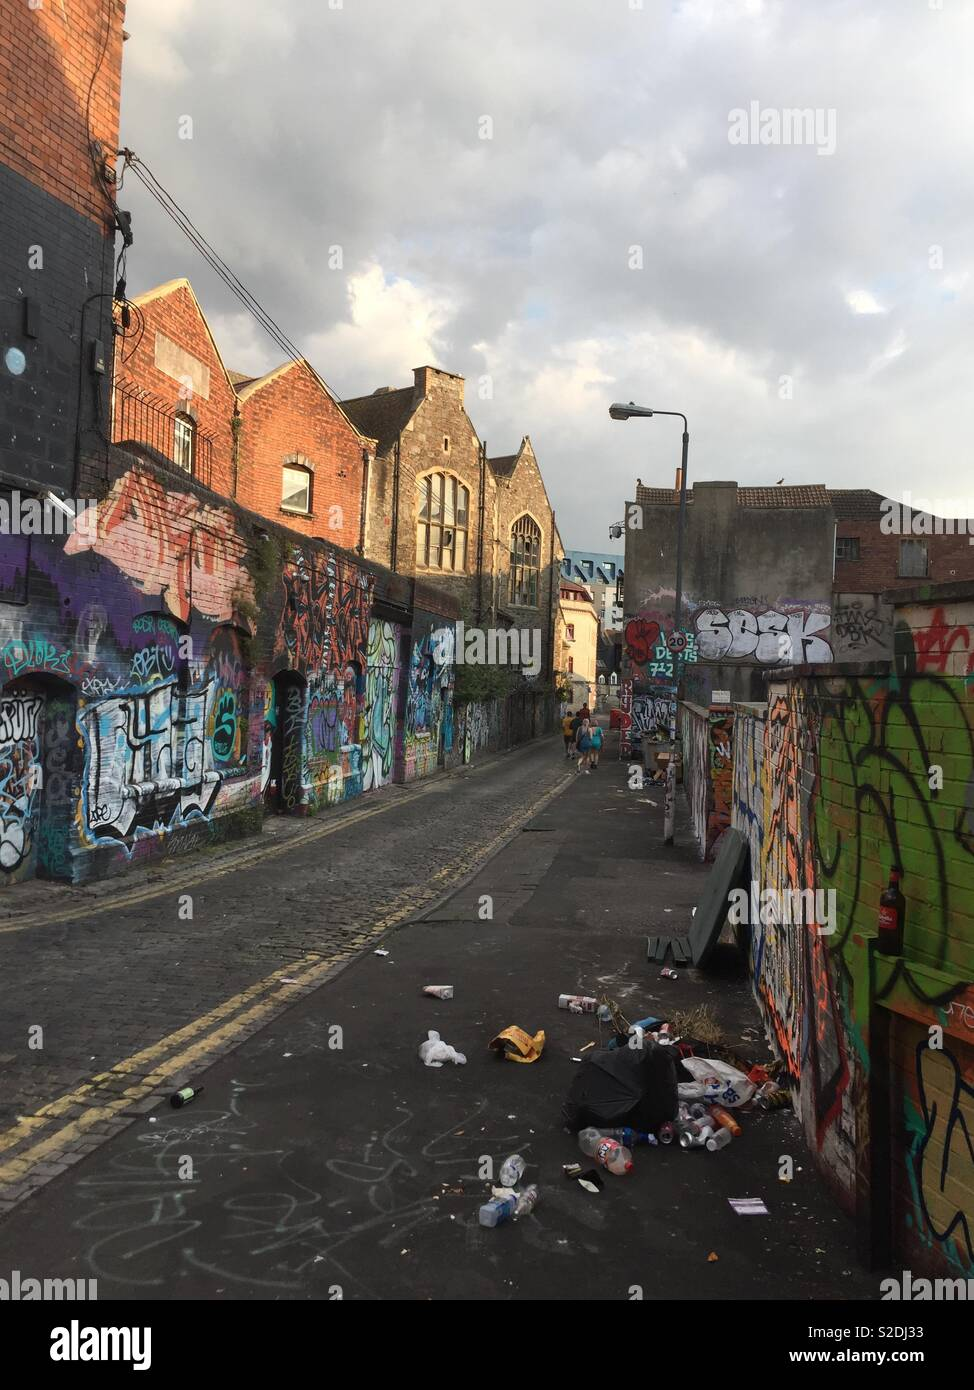 Backstreet in Stokes Croft Bristol with graffiti and rubbish - Stock Image